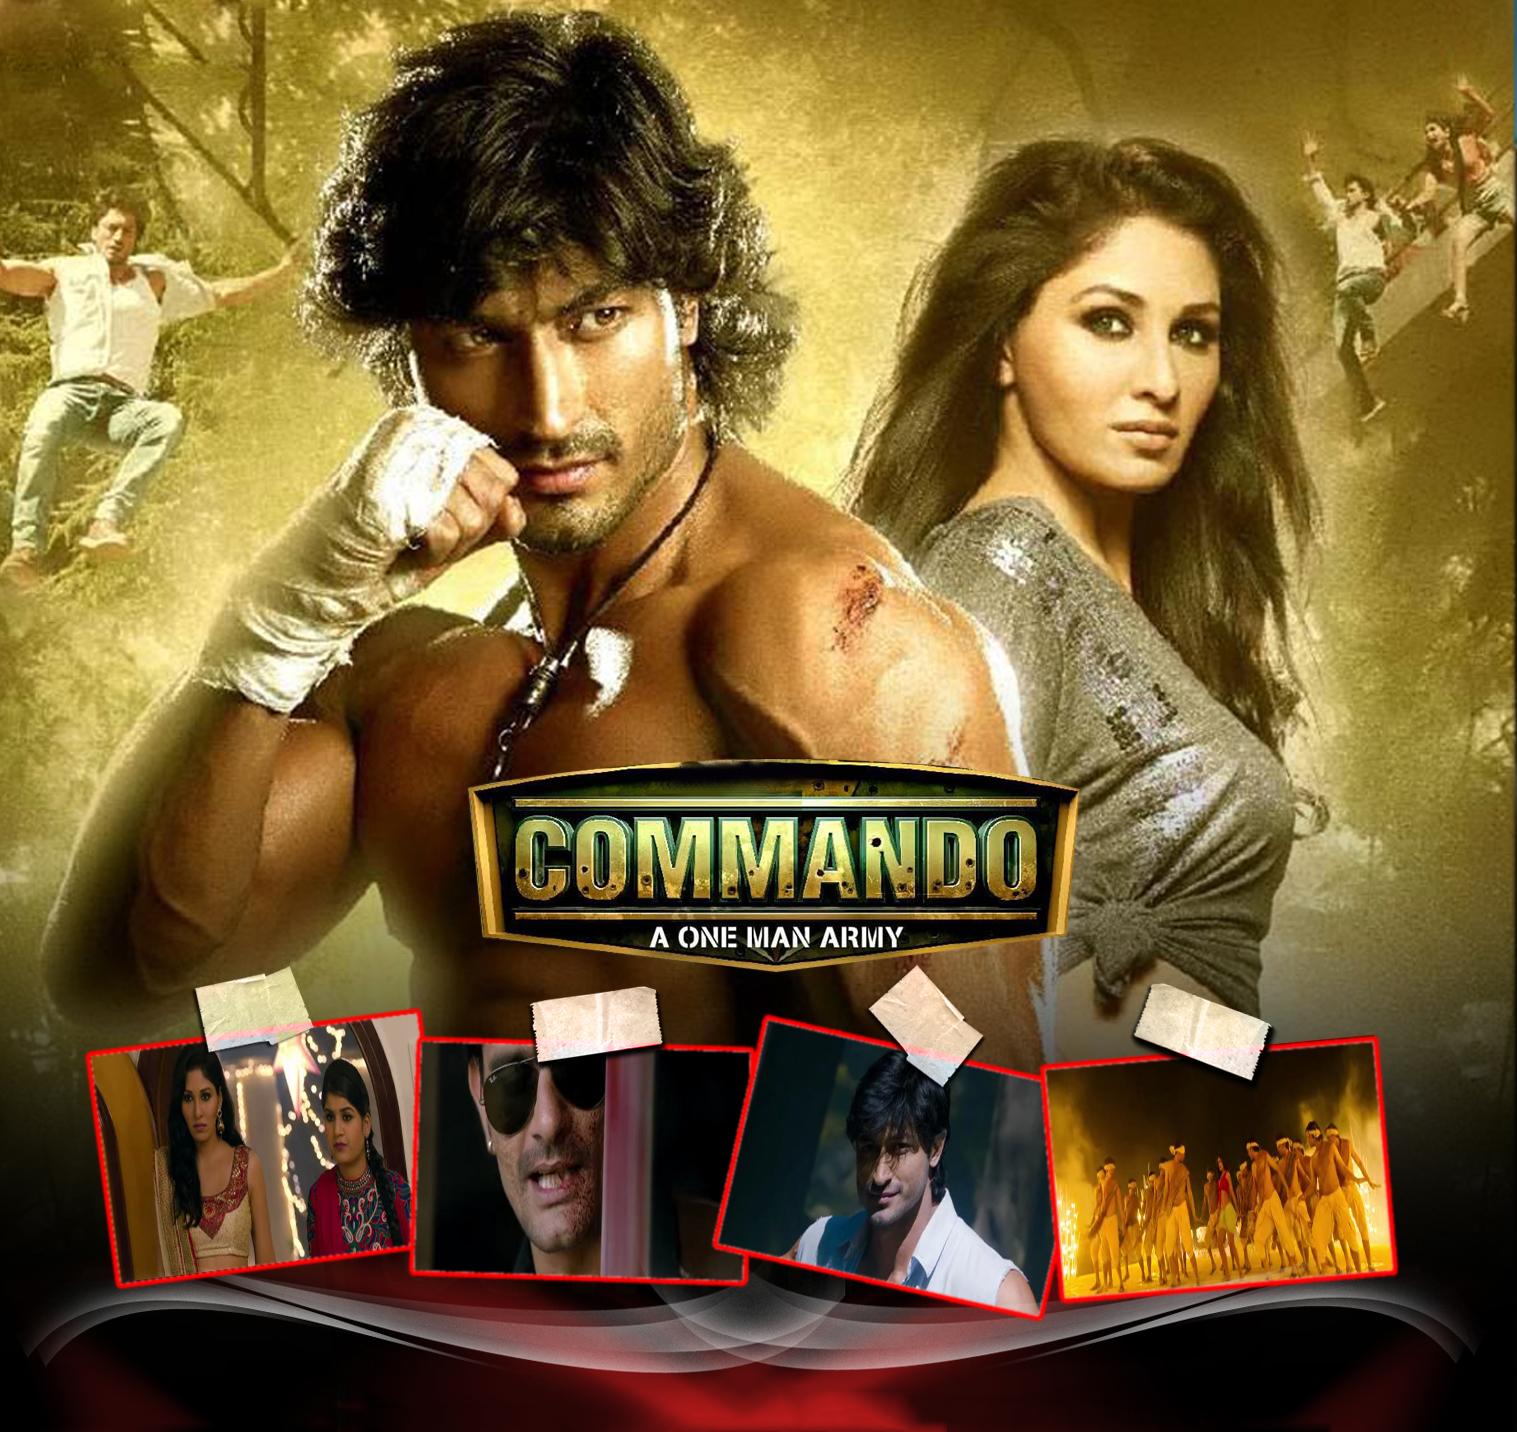 WEB-DL1080p | 2013 مدبلج Commando -- Seeders: 2 -- Leechers: 0